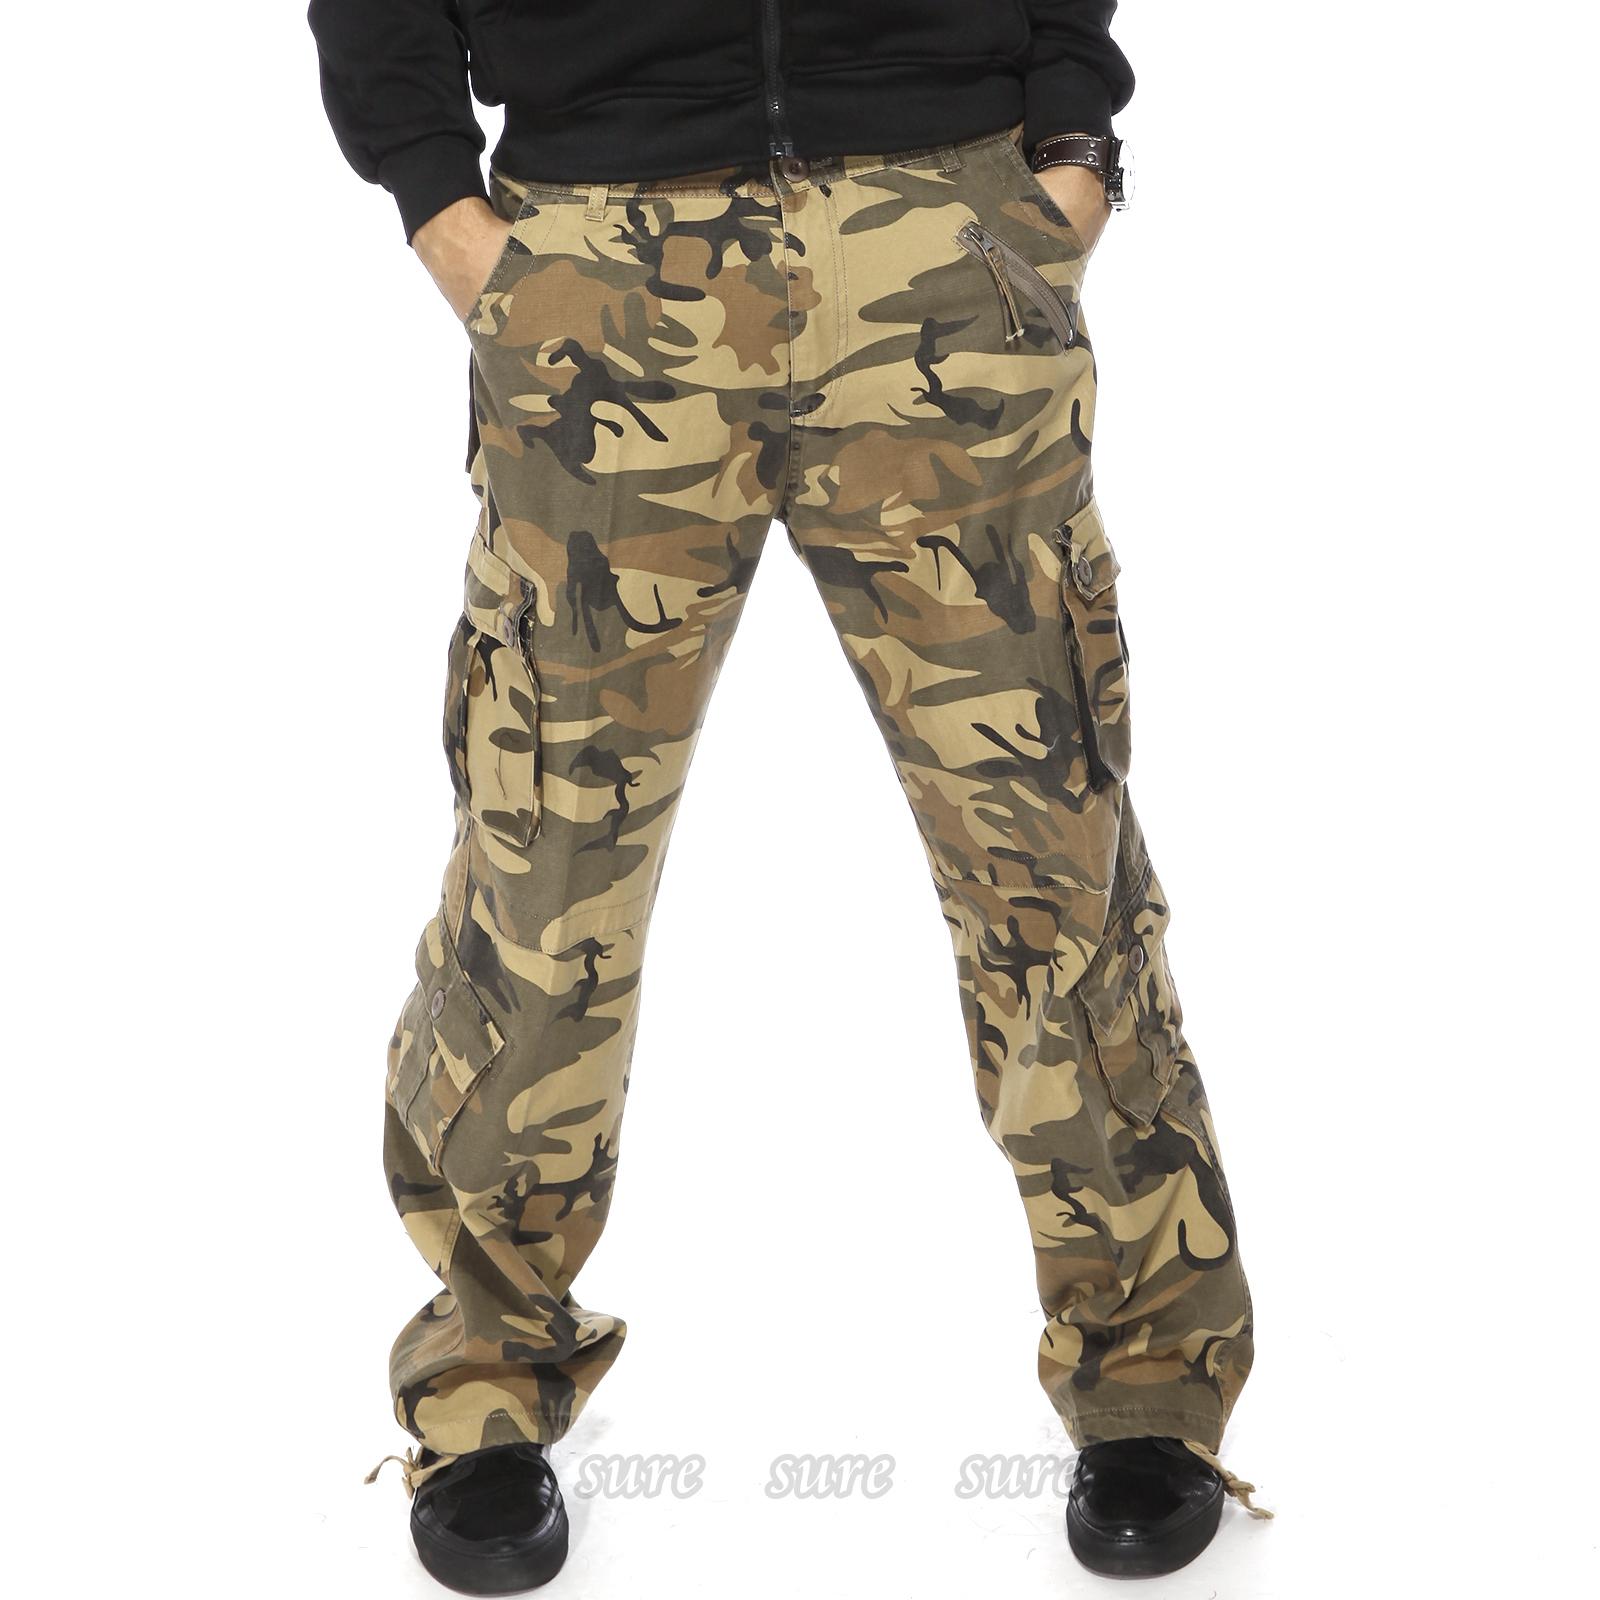 herrenhose army cargo jungen hose rangerhose bundeswehr tarn feldhose camouflage ebay. Black Bedroom Furniture Sets. Home Design Ideas